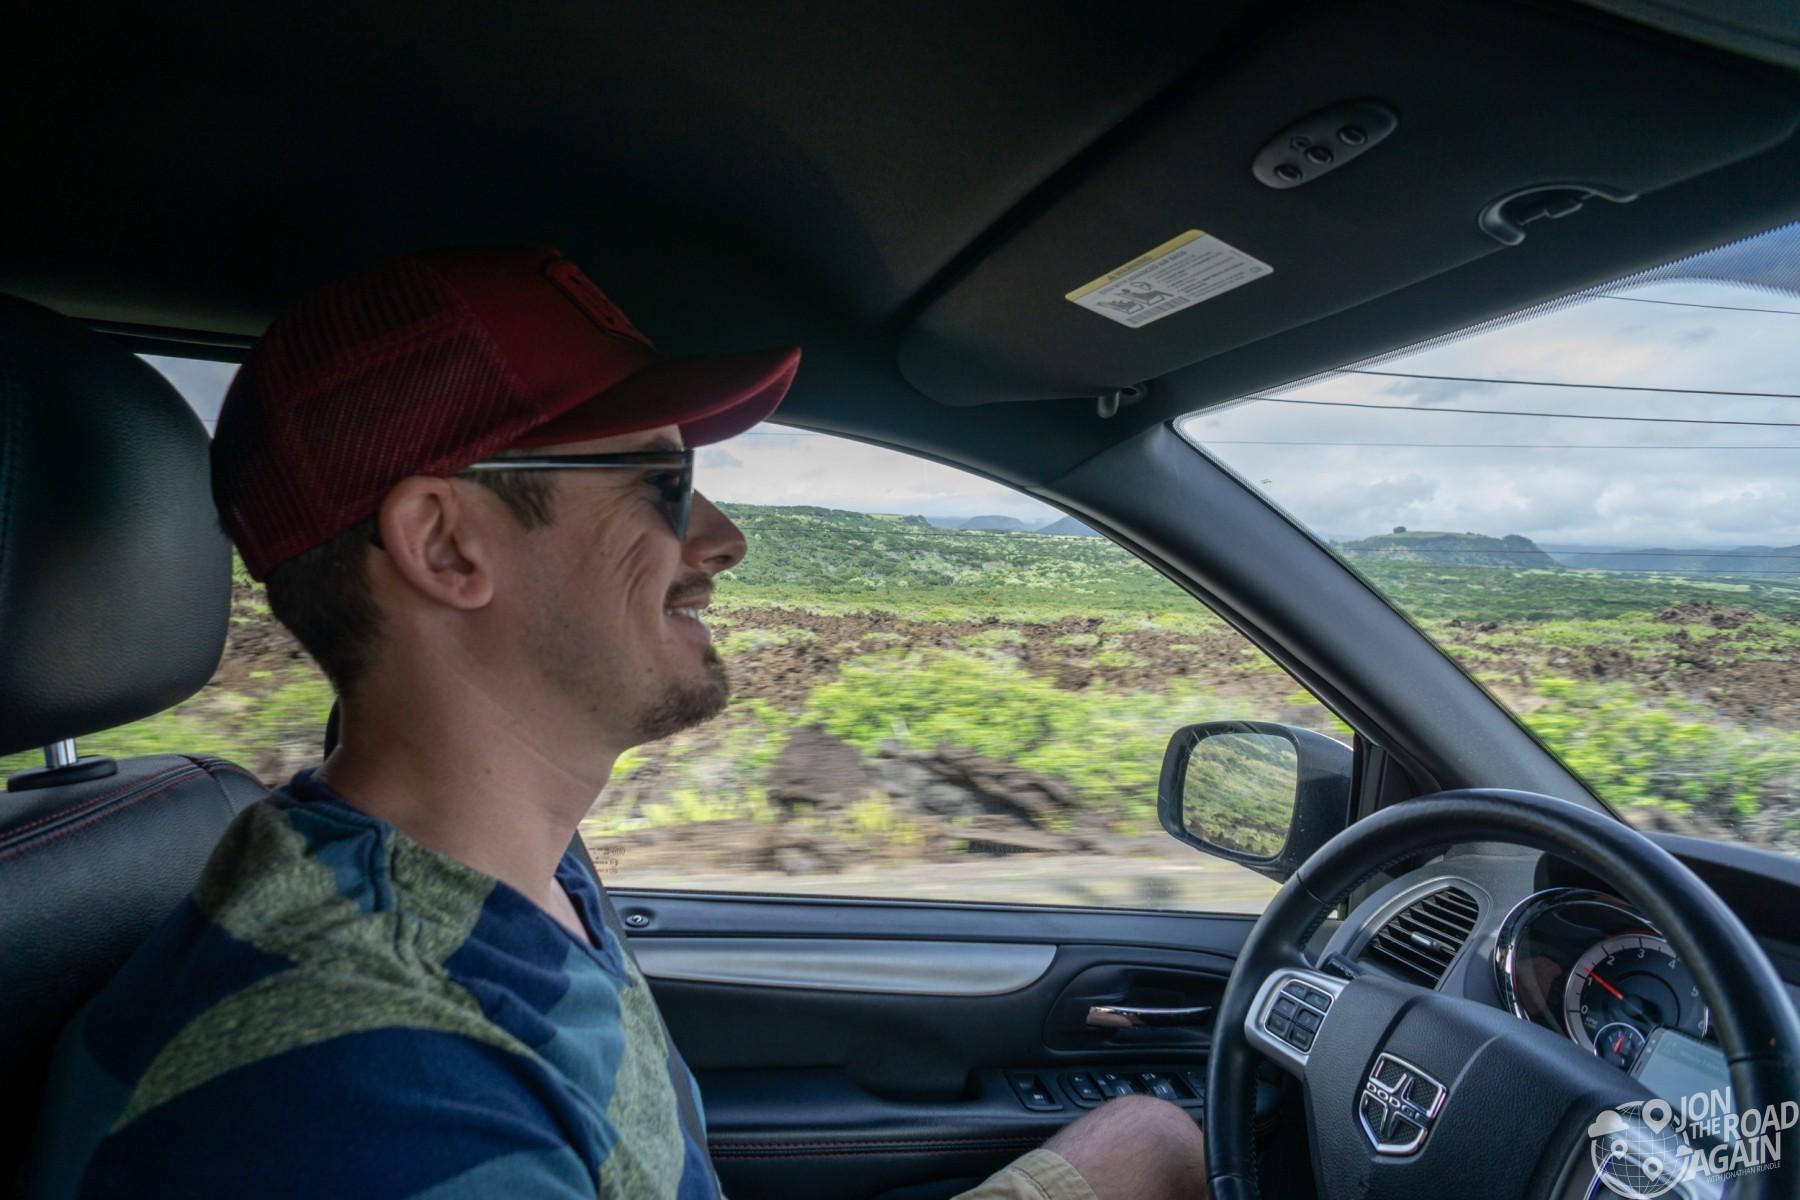 Jon the road again driving